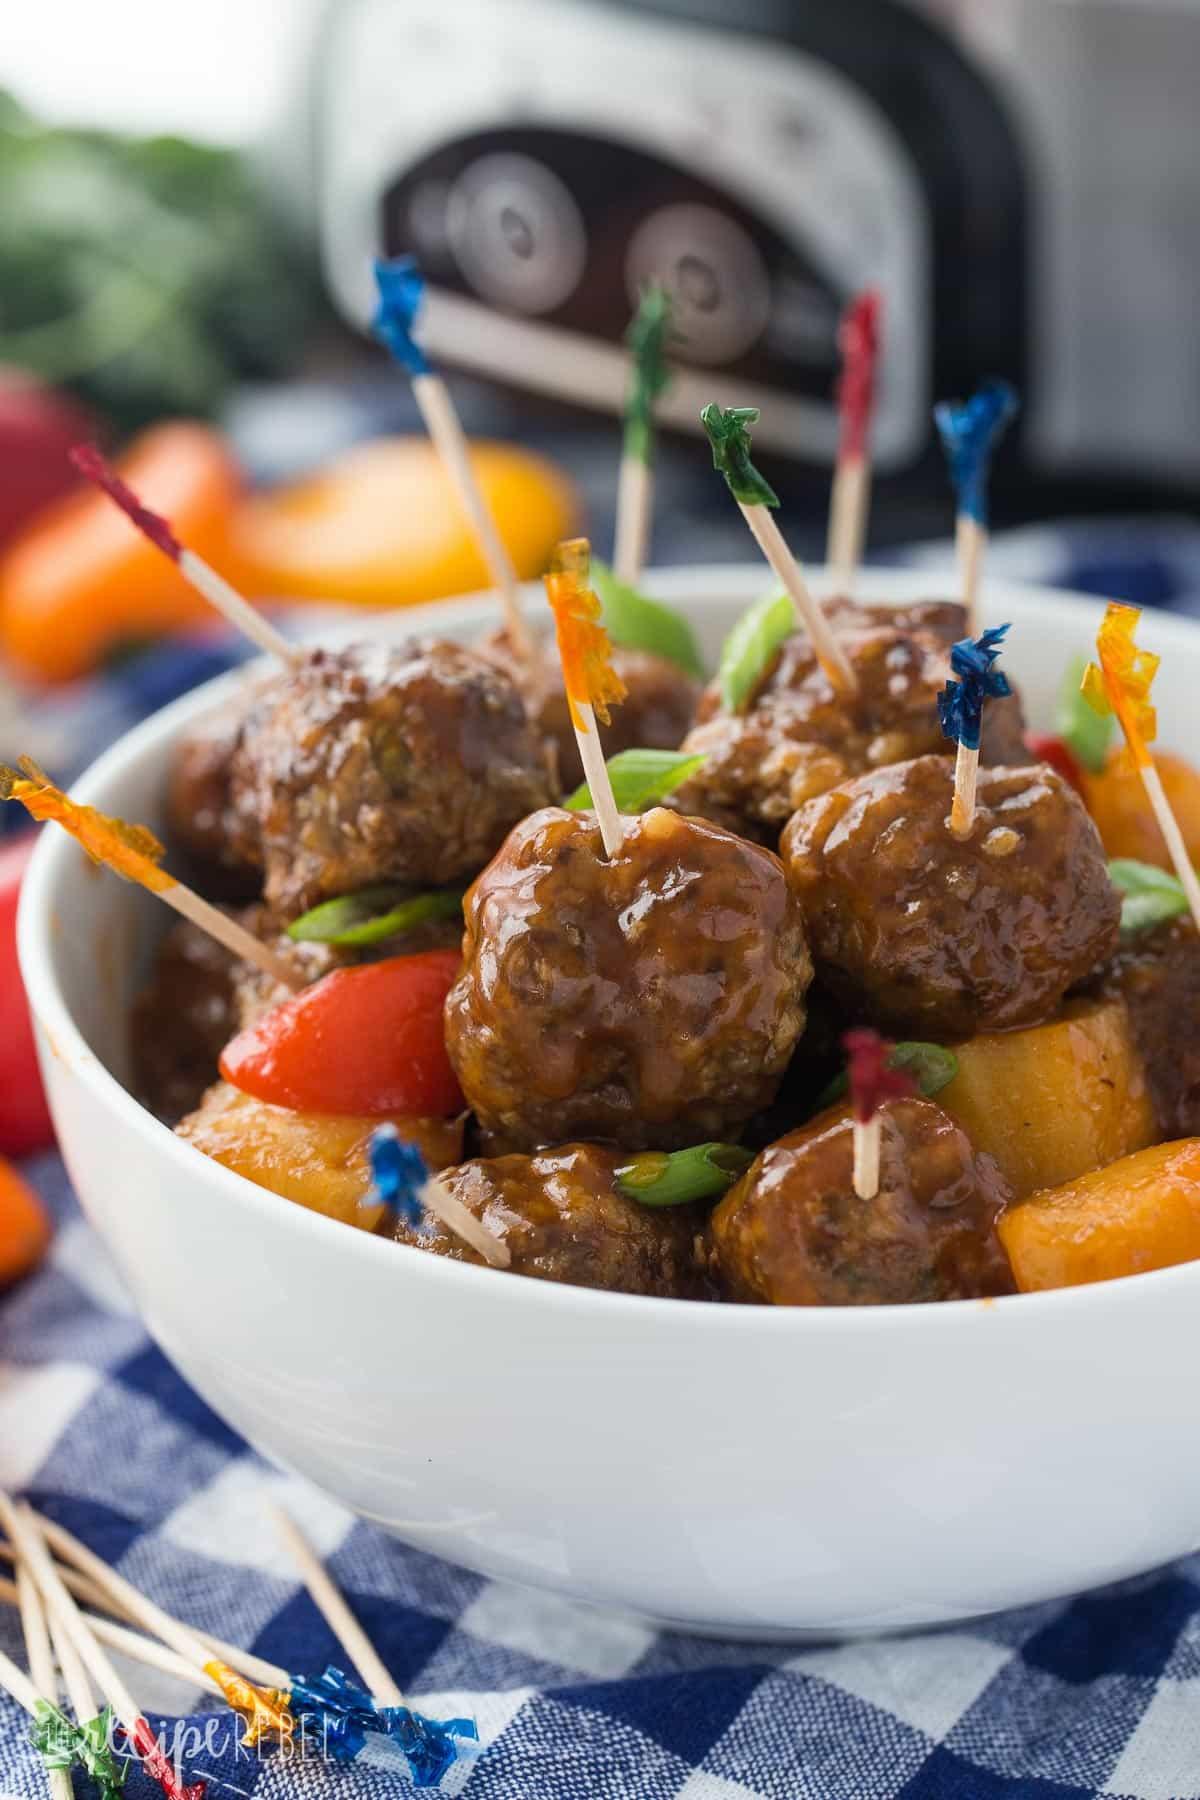 Slow Cooker Meatball Appetizer  Slow Cooker Pineapple Brown Sugar Meatballs easy appetizer